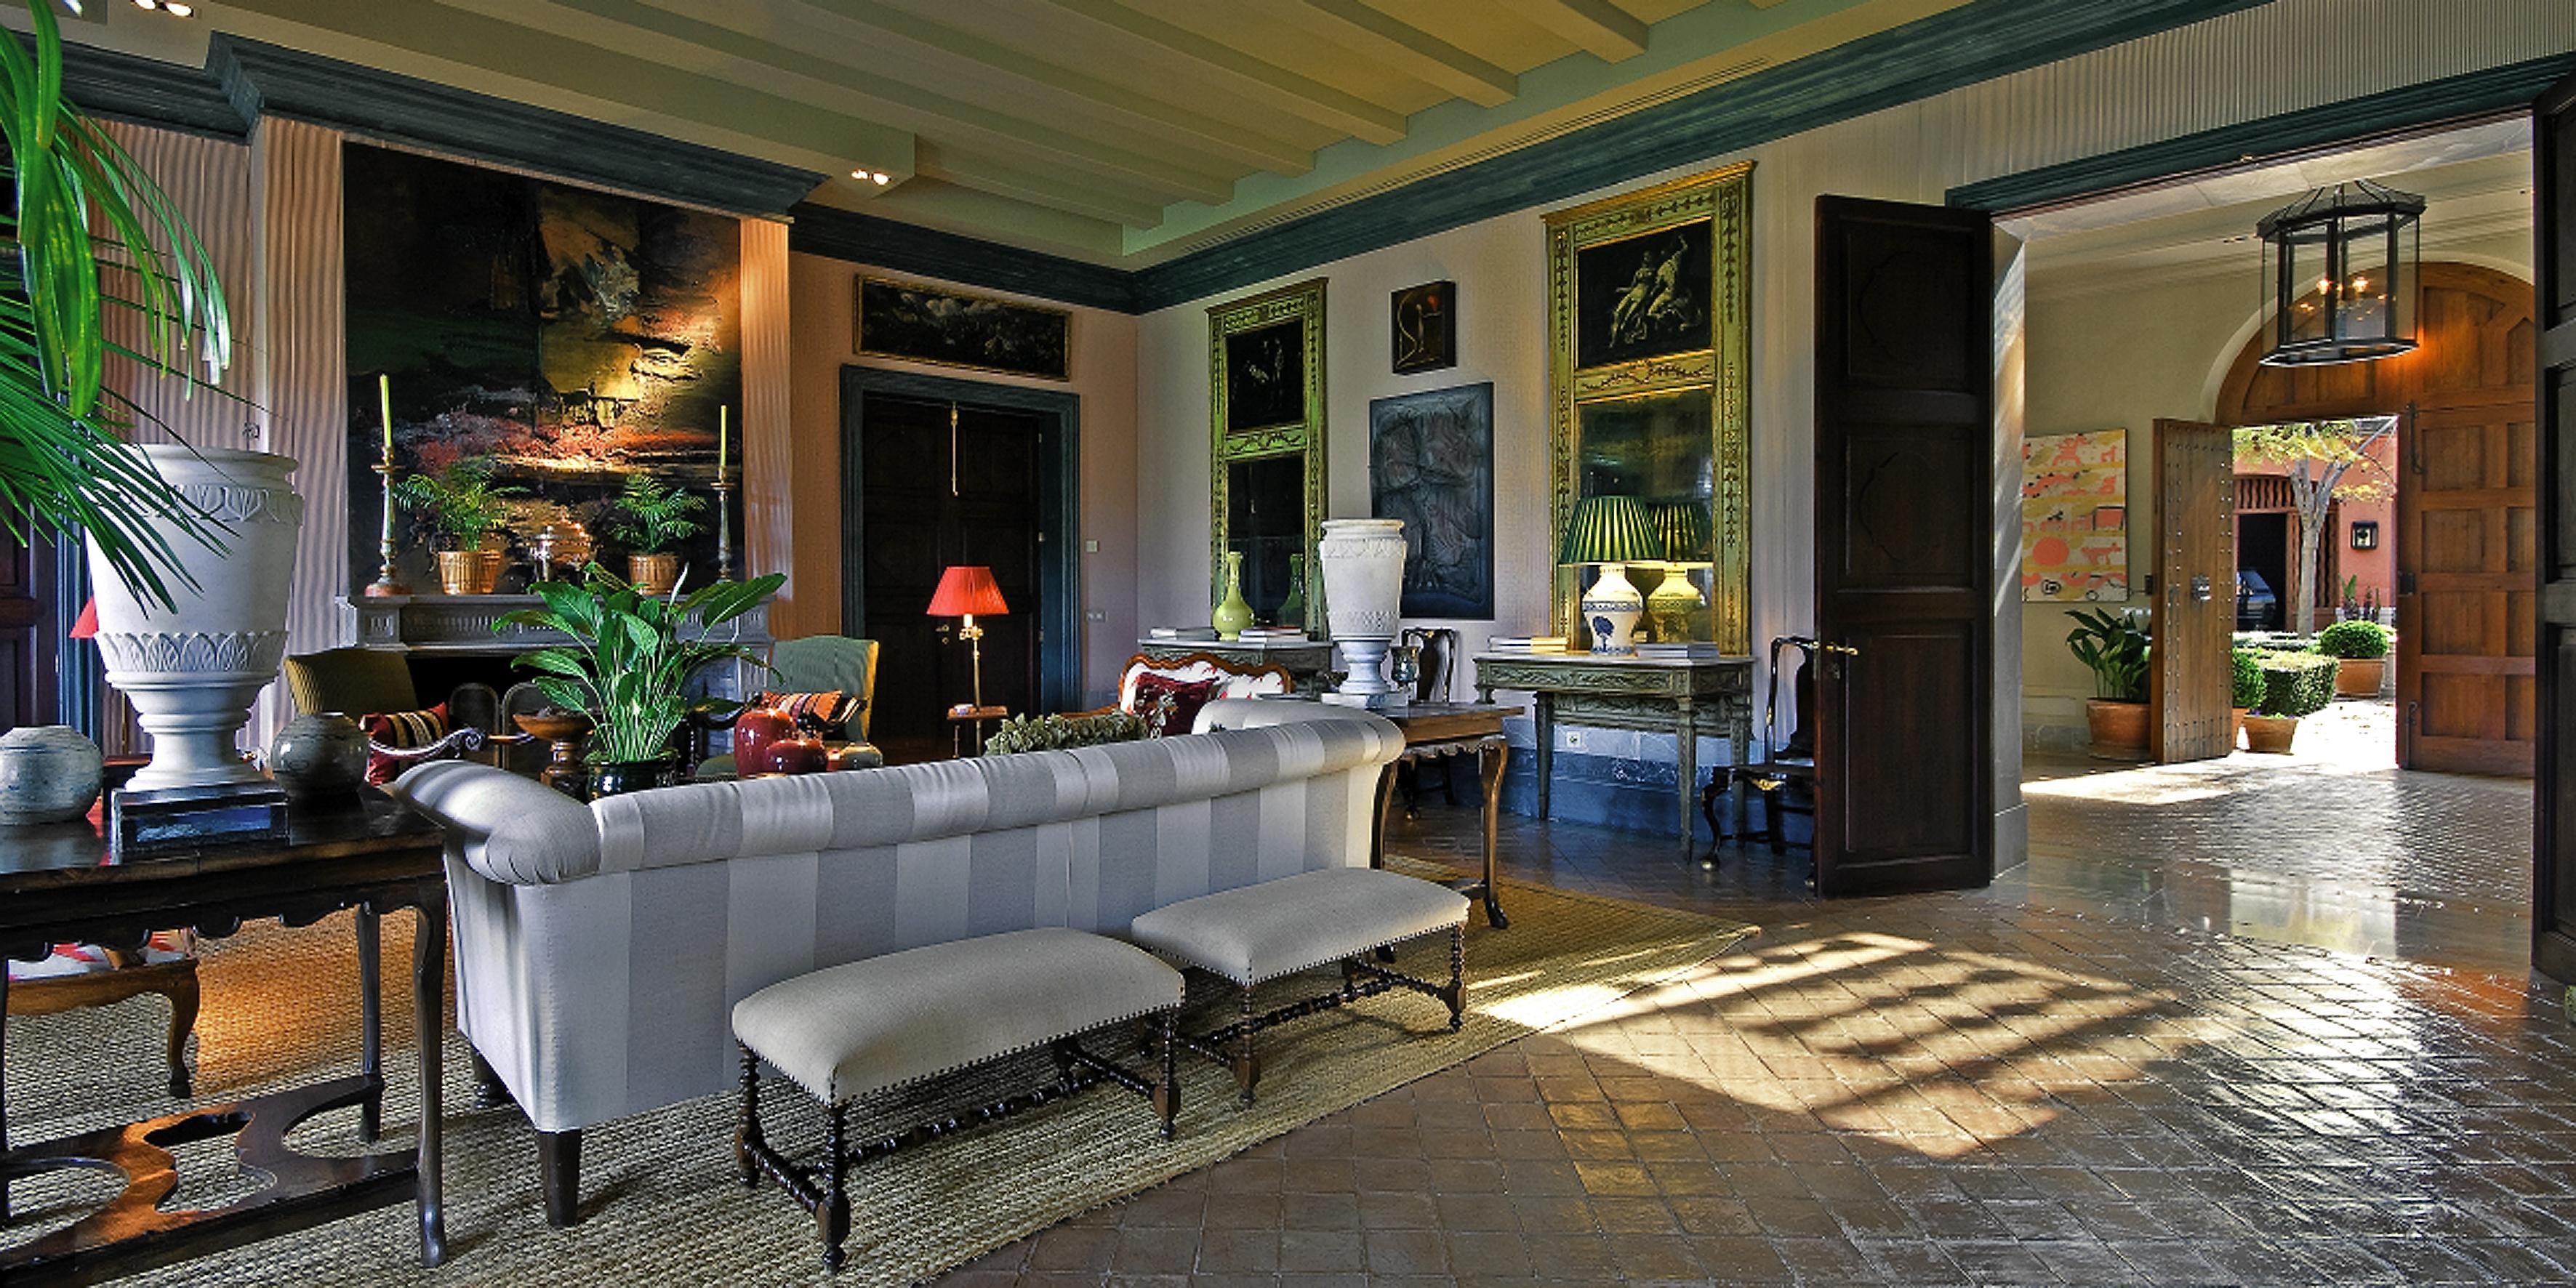 innenarchitekten berlin praktikum home design 3d create. Black Bedroom Furniture Sets. Home Design Ideas